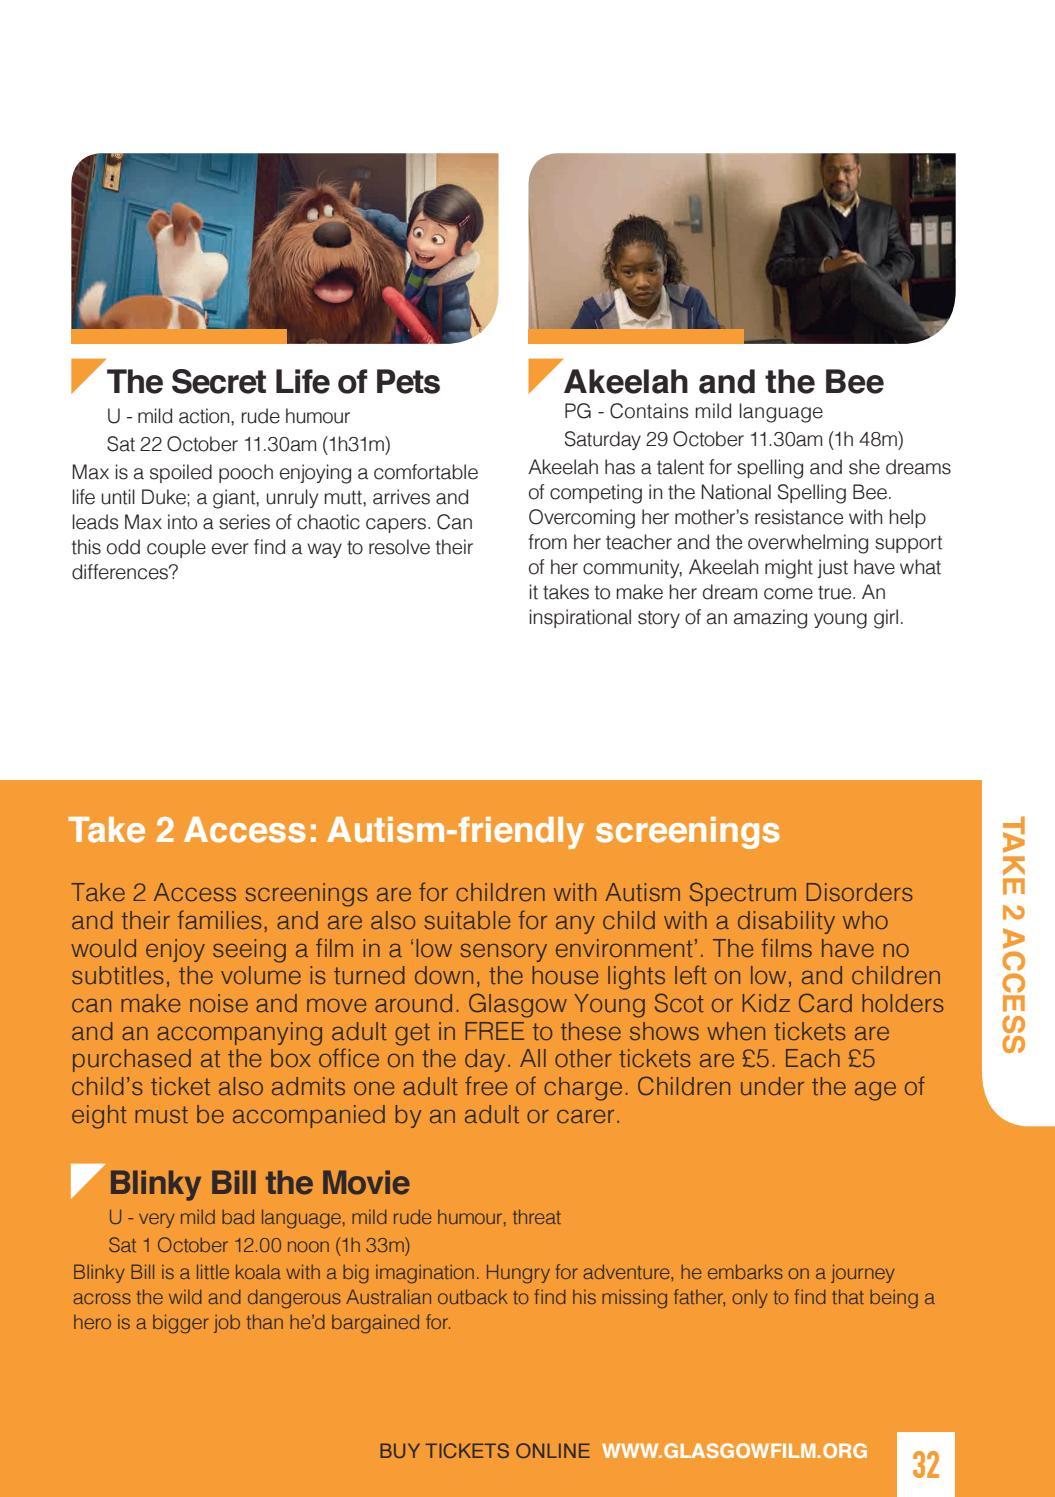 GFT Brochure October 2016 by Glasgow Film - issuu